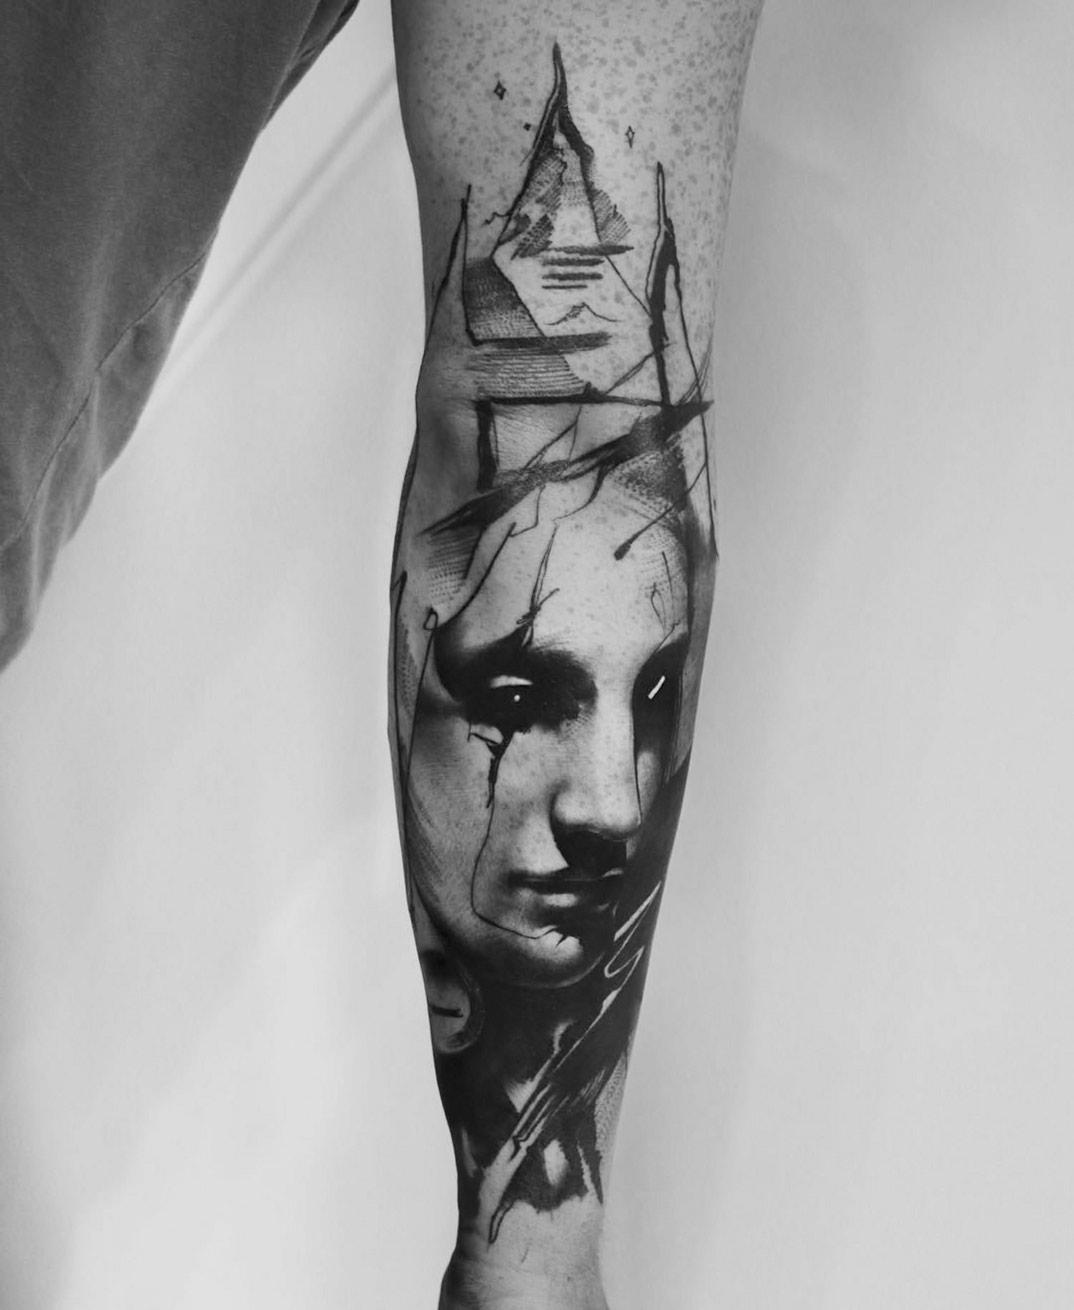 drammatici-ritratti-misteriosi-tatuaggi-monocromatici-kurt-staudinger-06